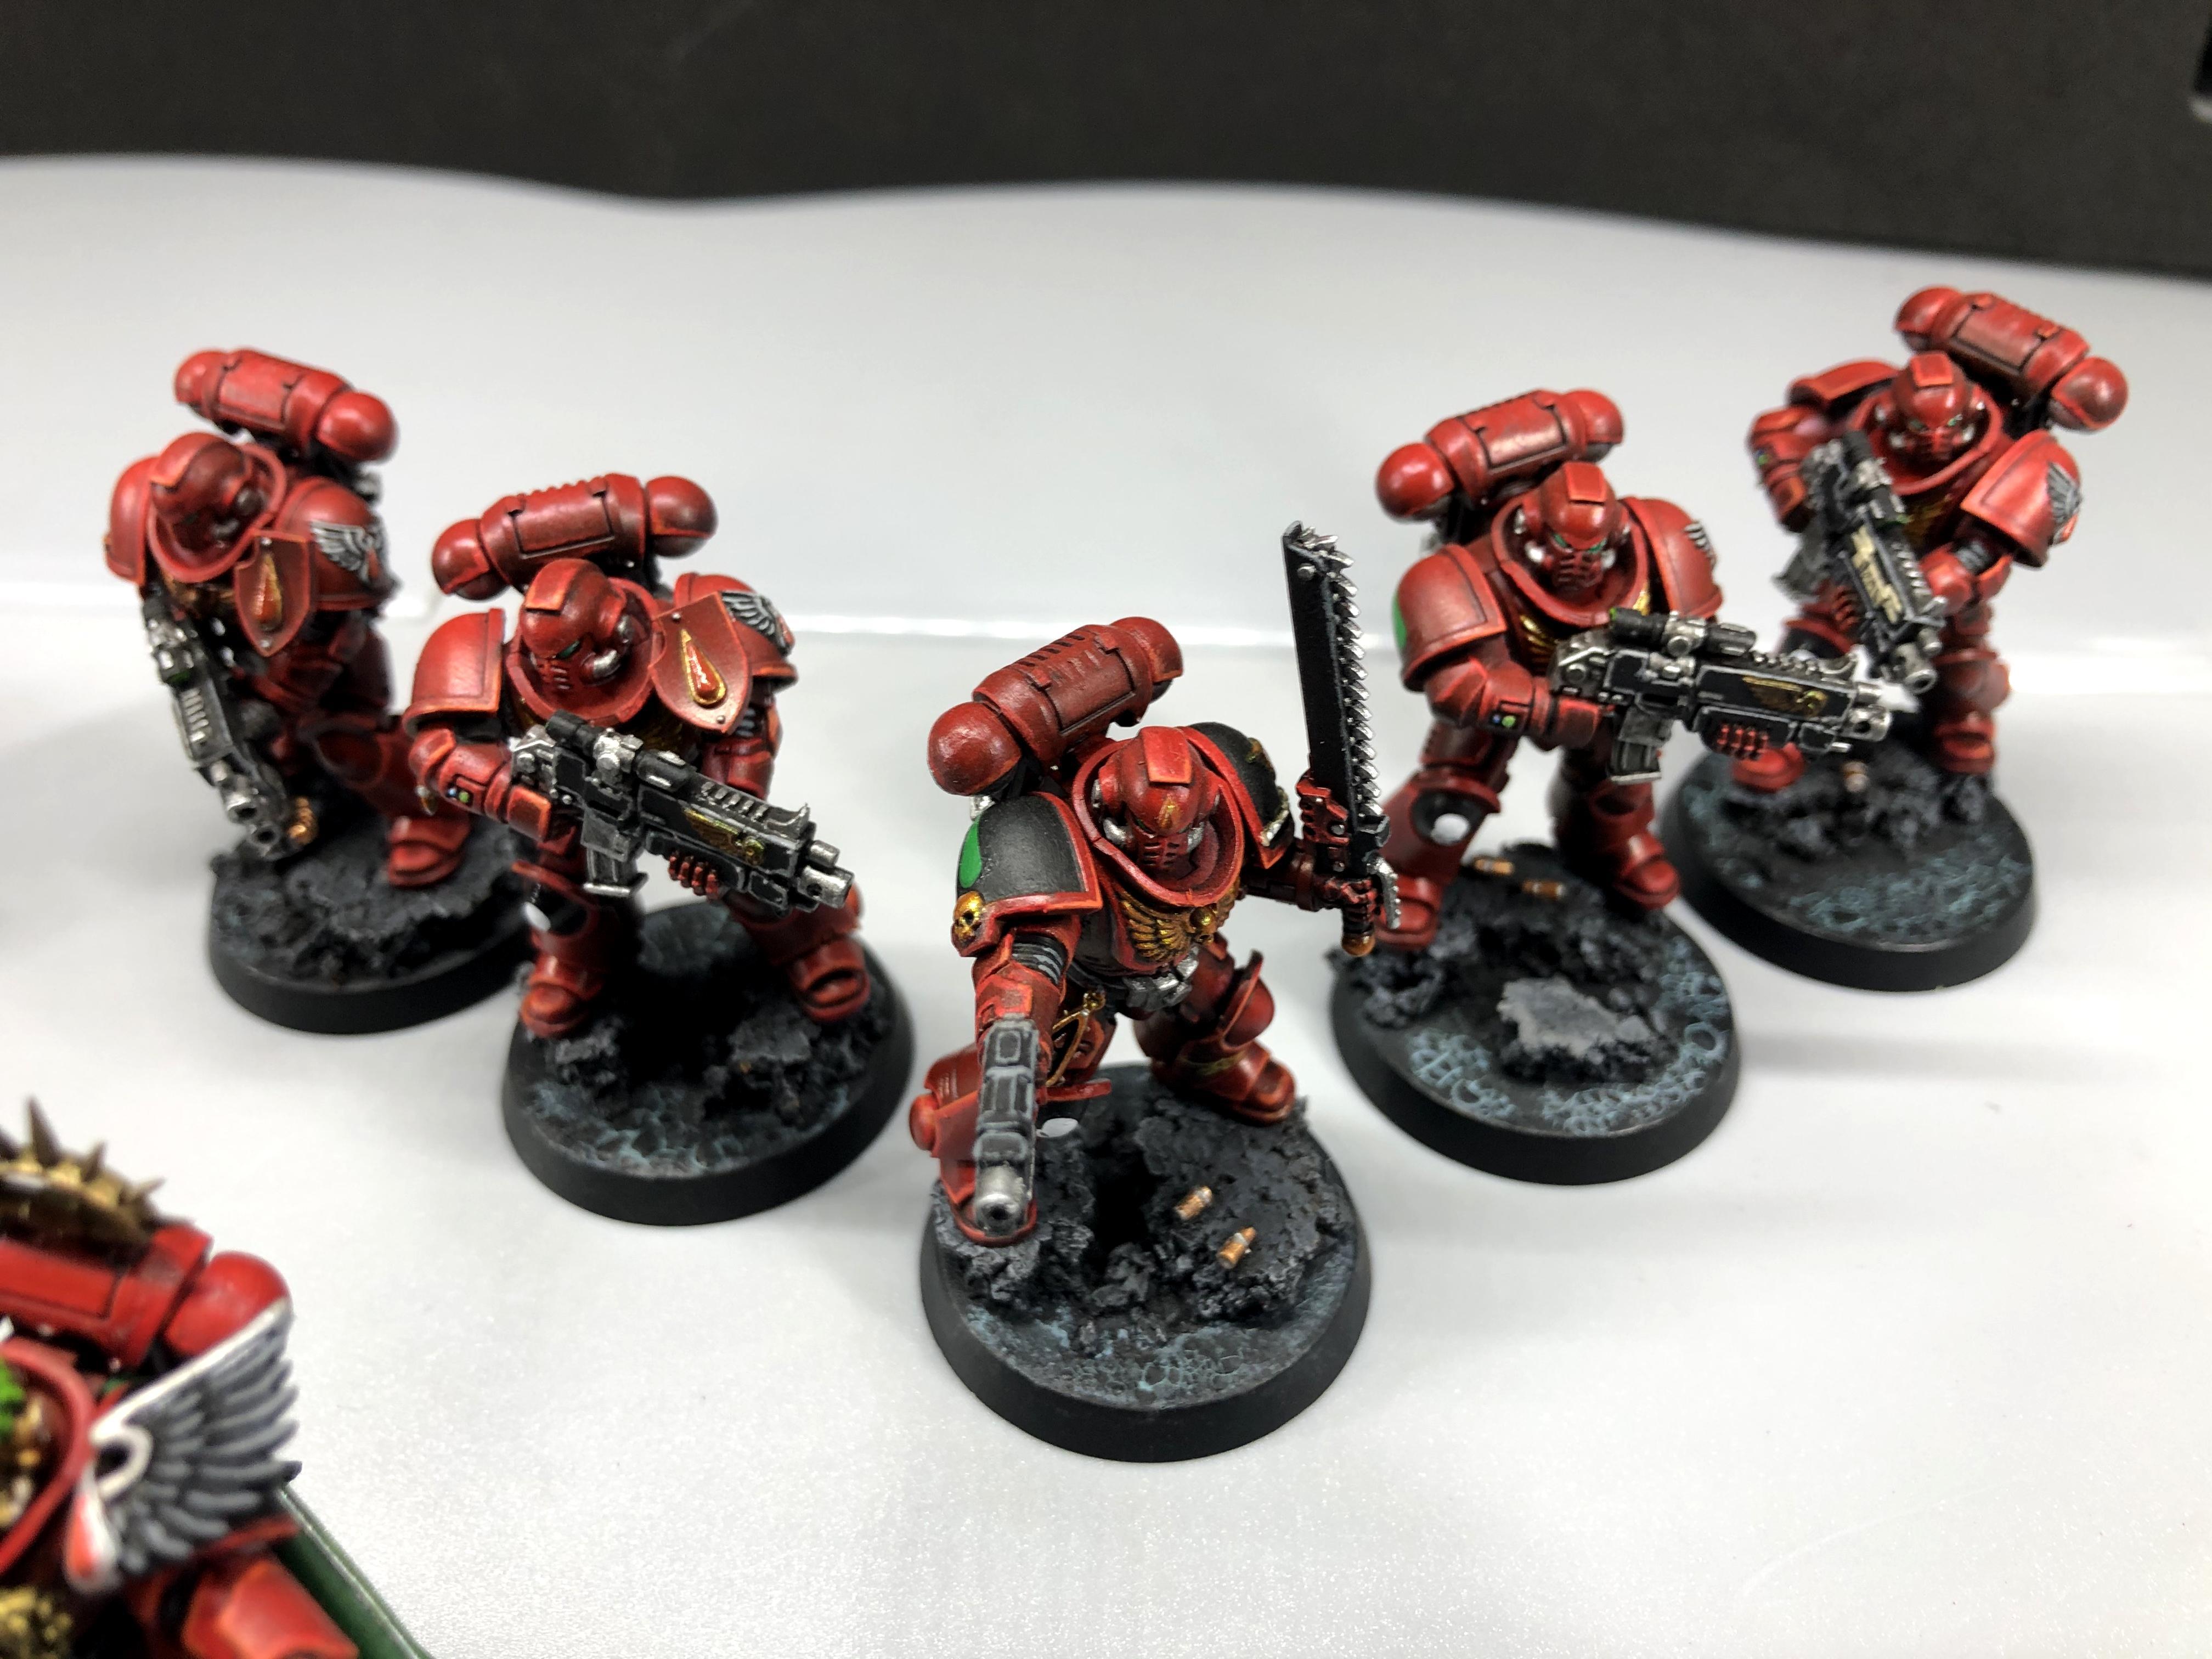 Blood Angels, Intercessors, Primaris, Primaris Marines, Space Marines, Warhammer 40,000, Warhammer Fantasy